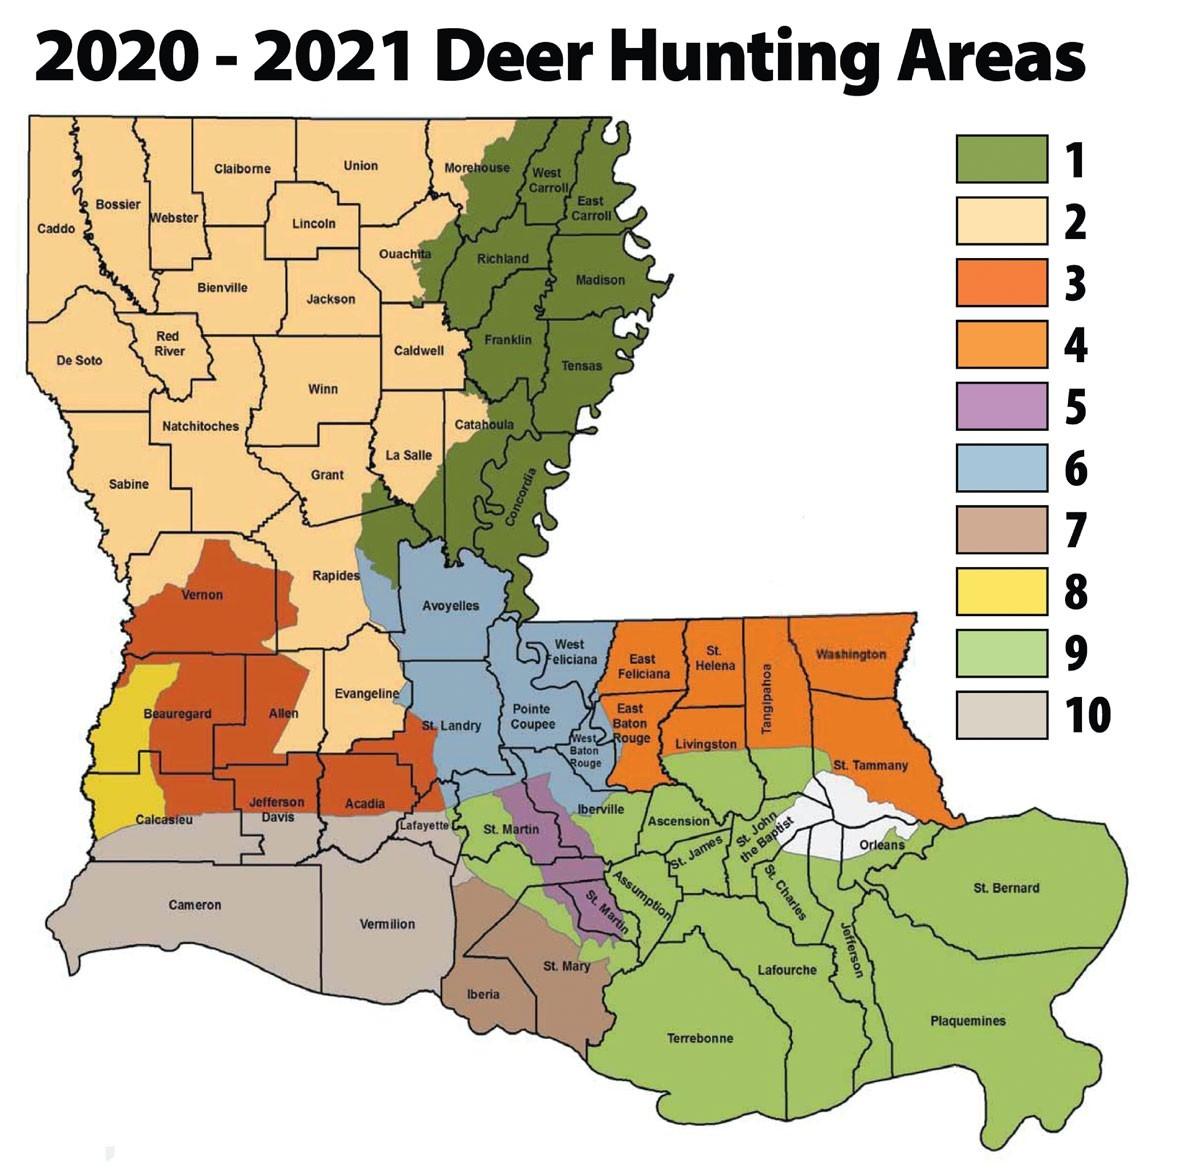 Louisiana'S 2020 Rut Report - Louisiana Sportsman-Hunting The Rut In 2021